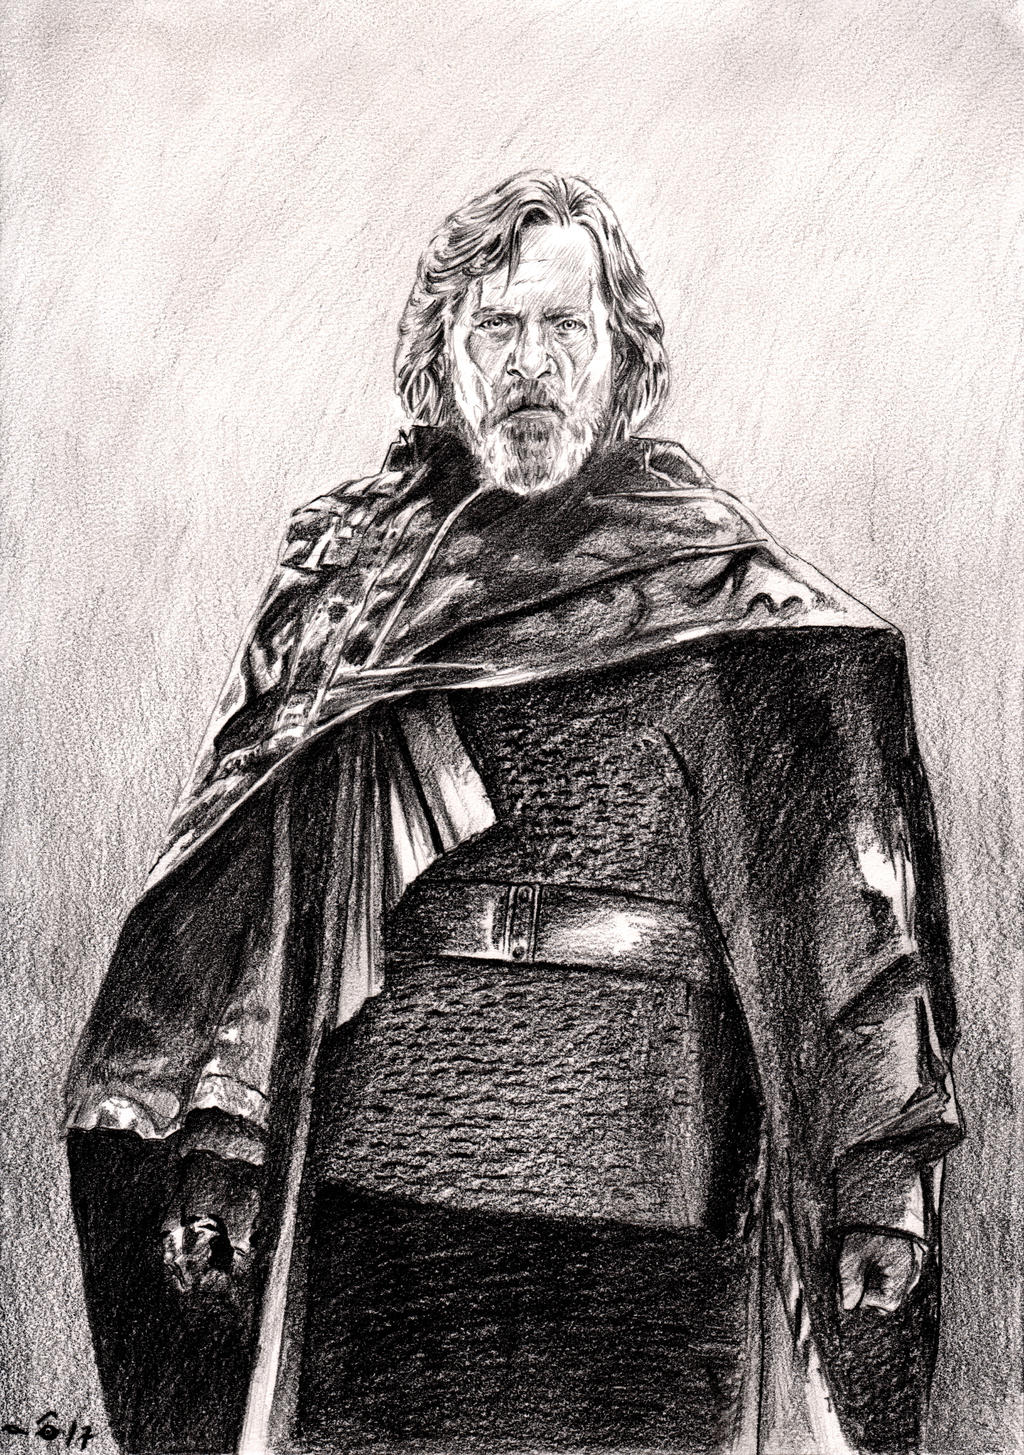 Mark Hamill as Luke Skywalker by emalterre